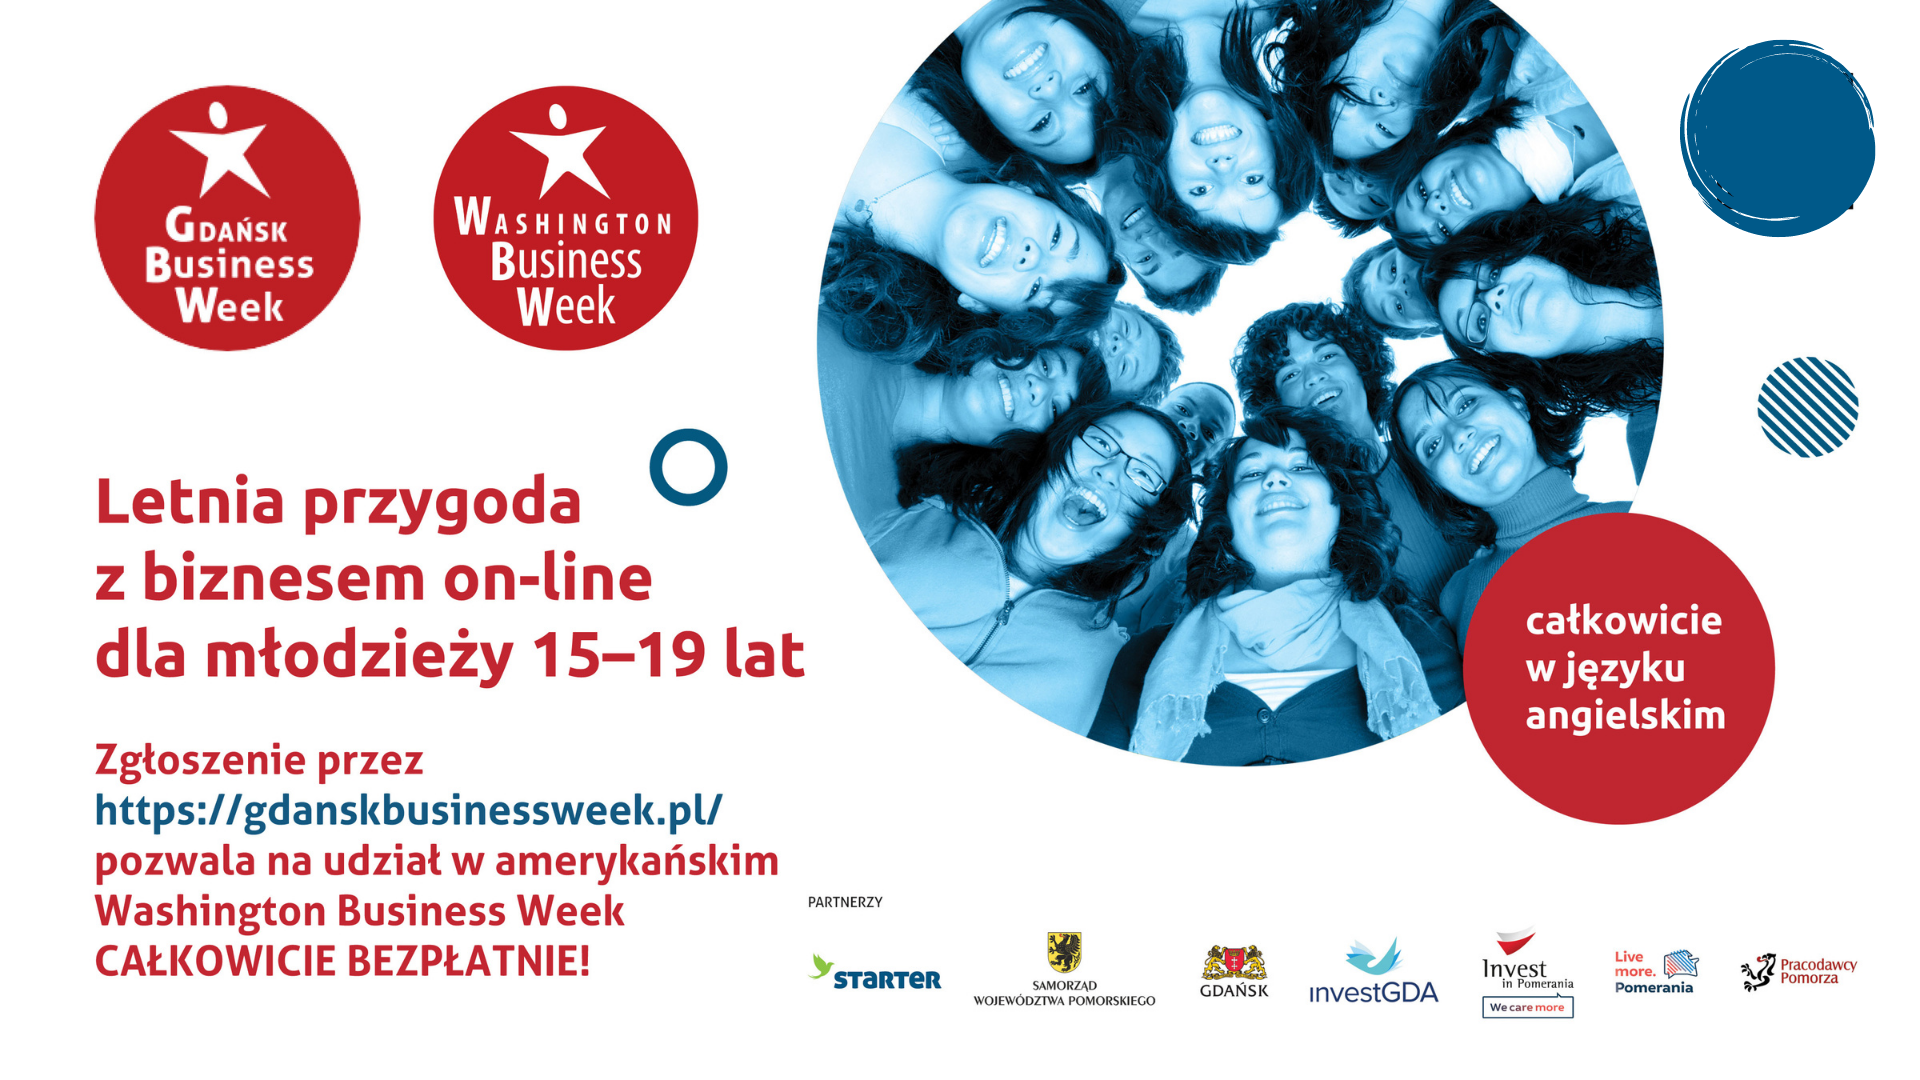 Gdańsk Business Week 2021